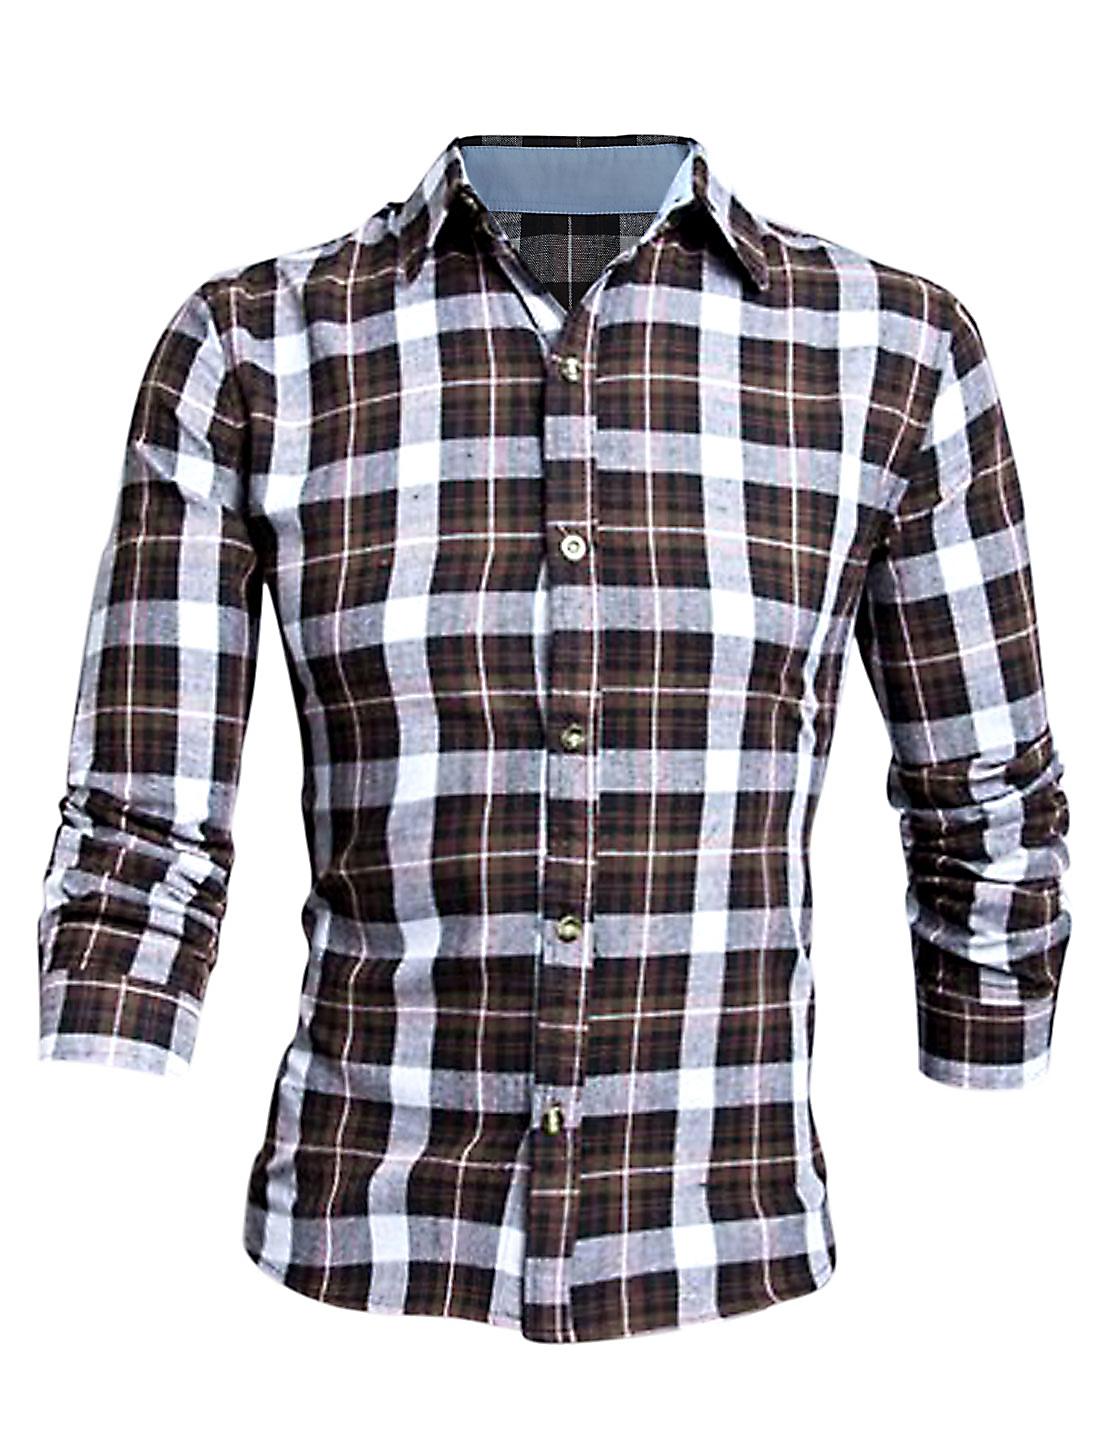 Men Dark Brown Point Collar Single Breasted Plaids Button Cuffs Shirt M